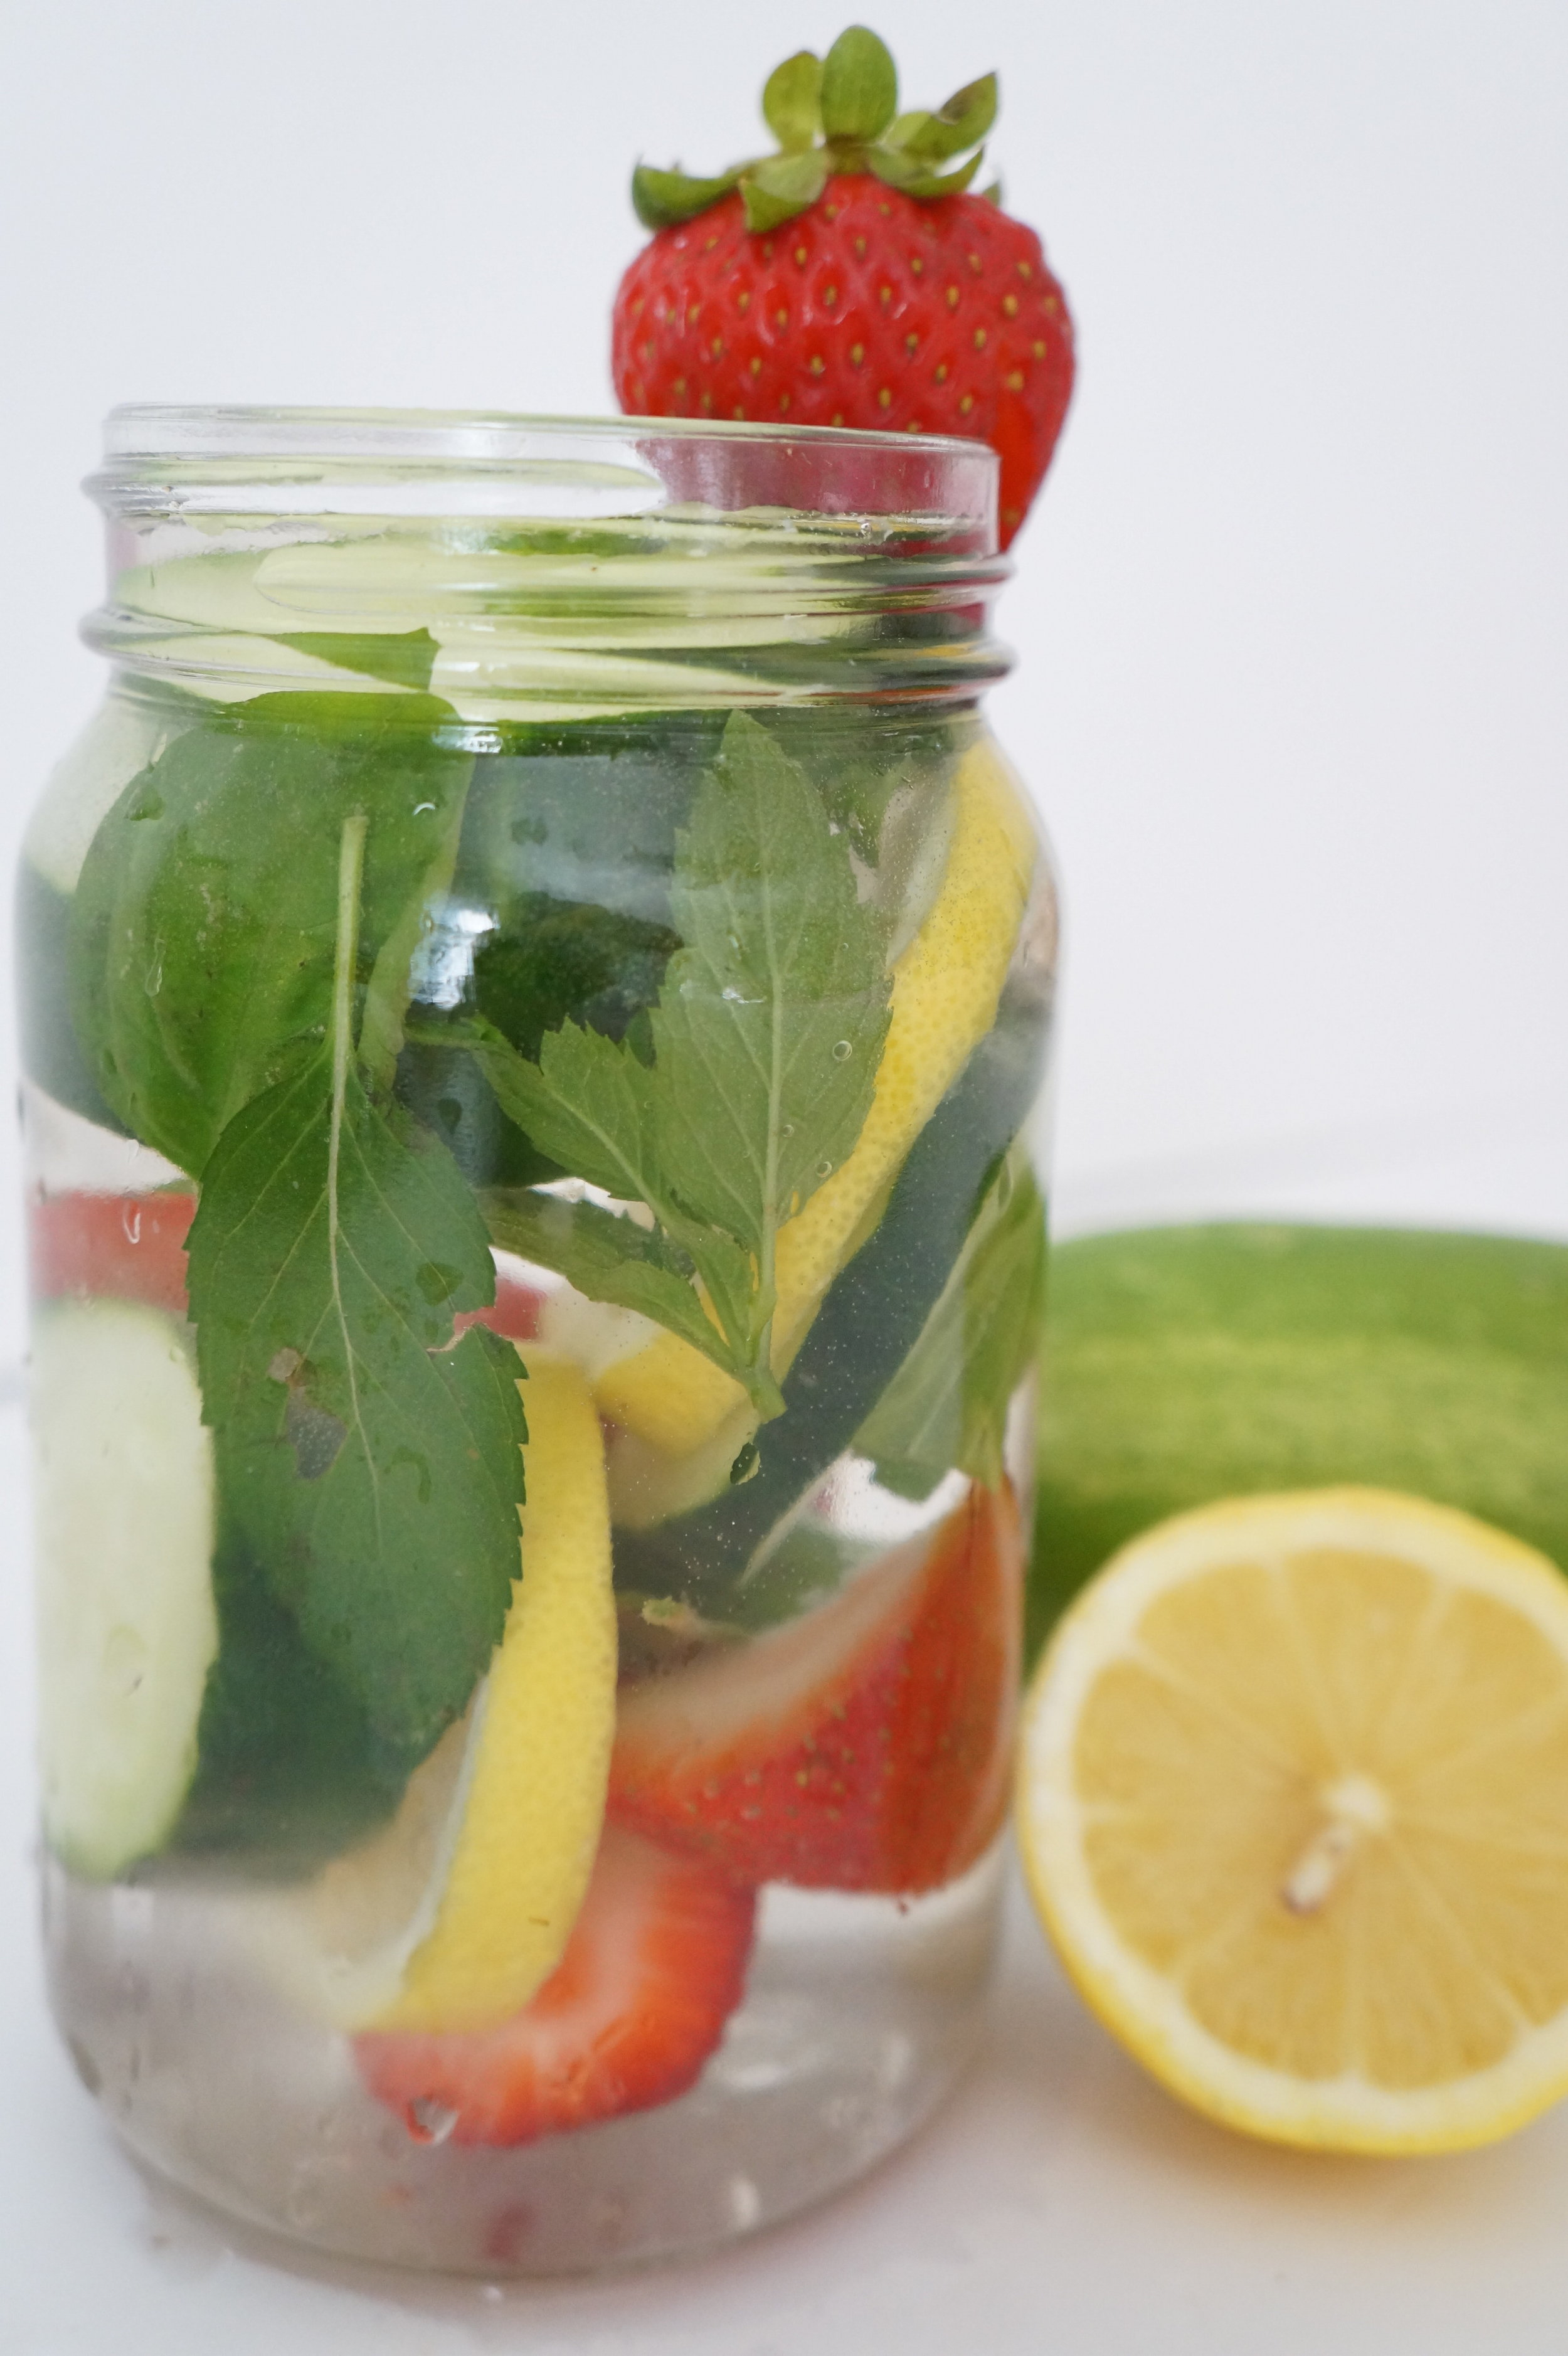 Andrea Fenise Memphis Fashion Blogger shares 3 easy cucumber recipes